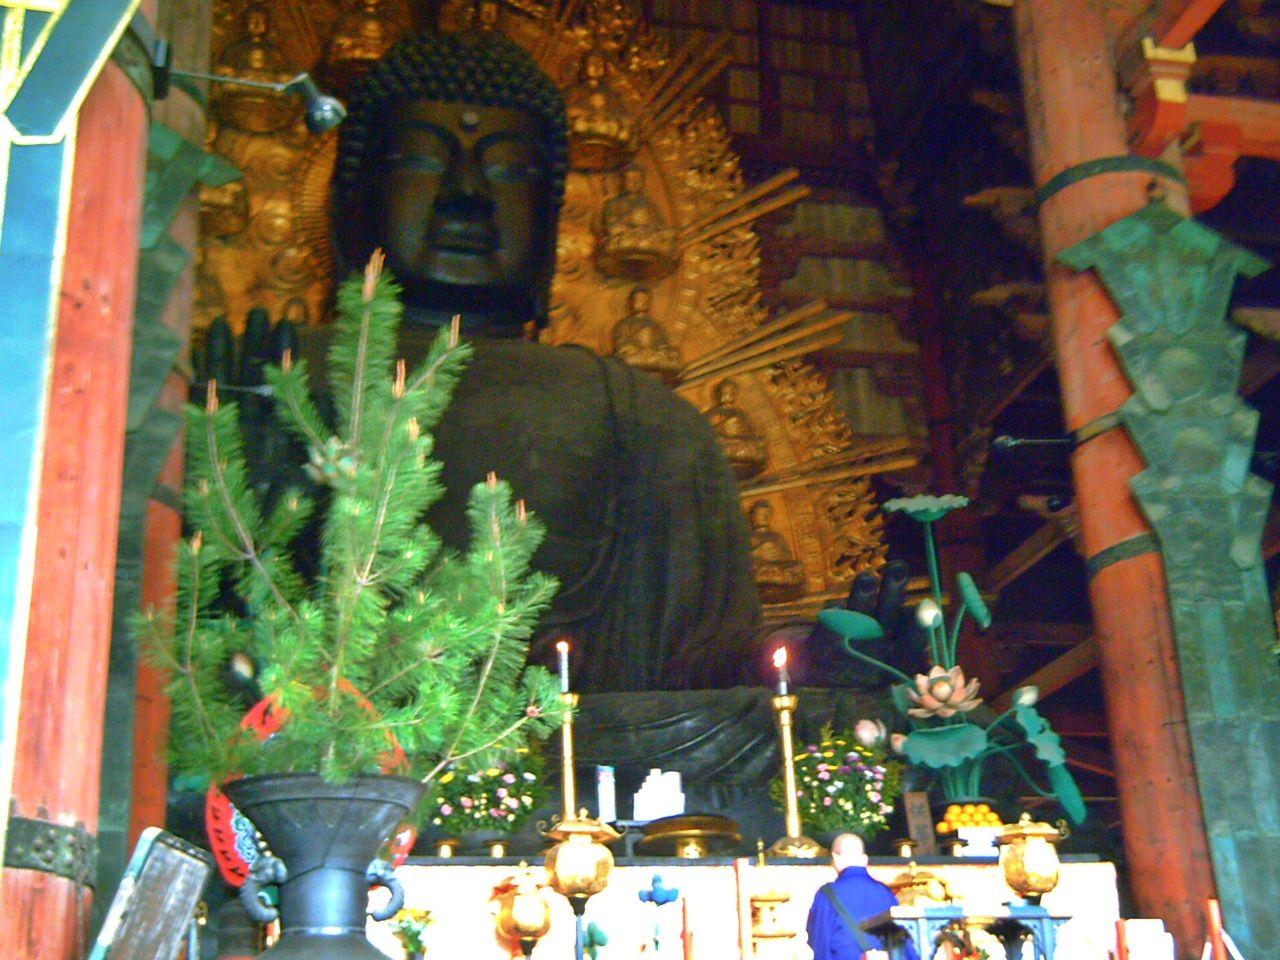 Templo Todaiji en Nara Japon. Gran buda